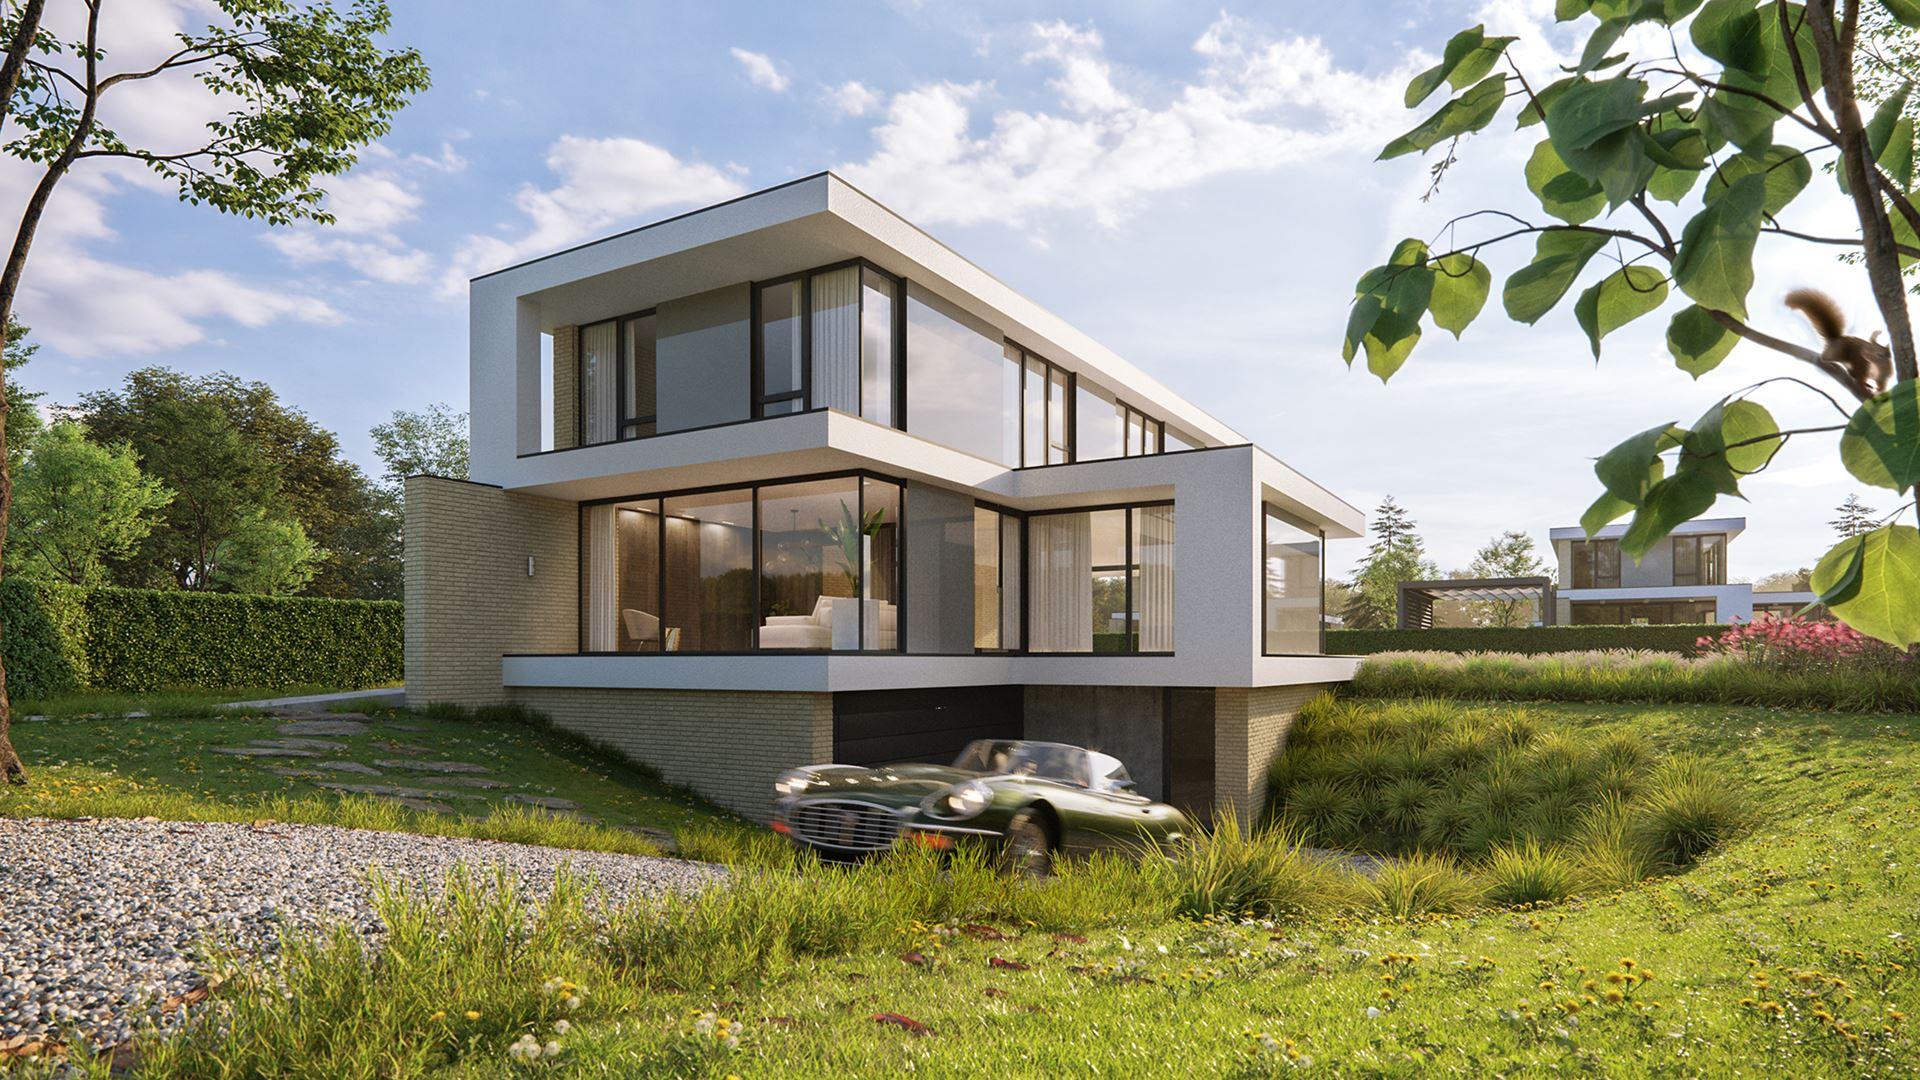 Interieur inspiratie nieuwbouwproject Ambyerveld Maastricht